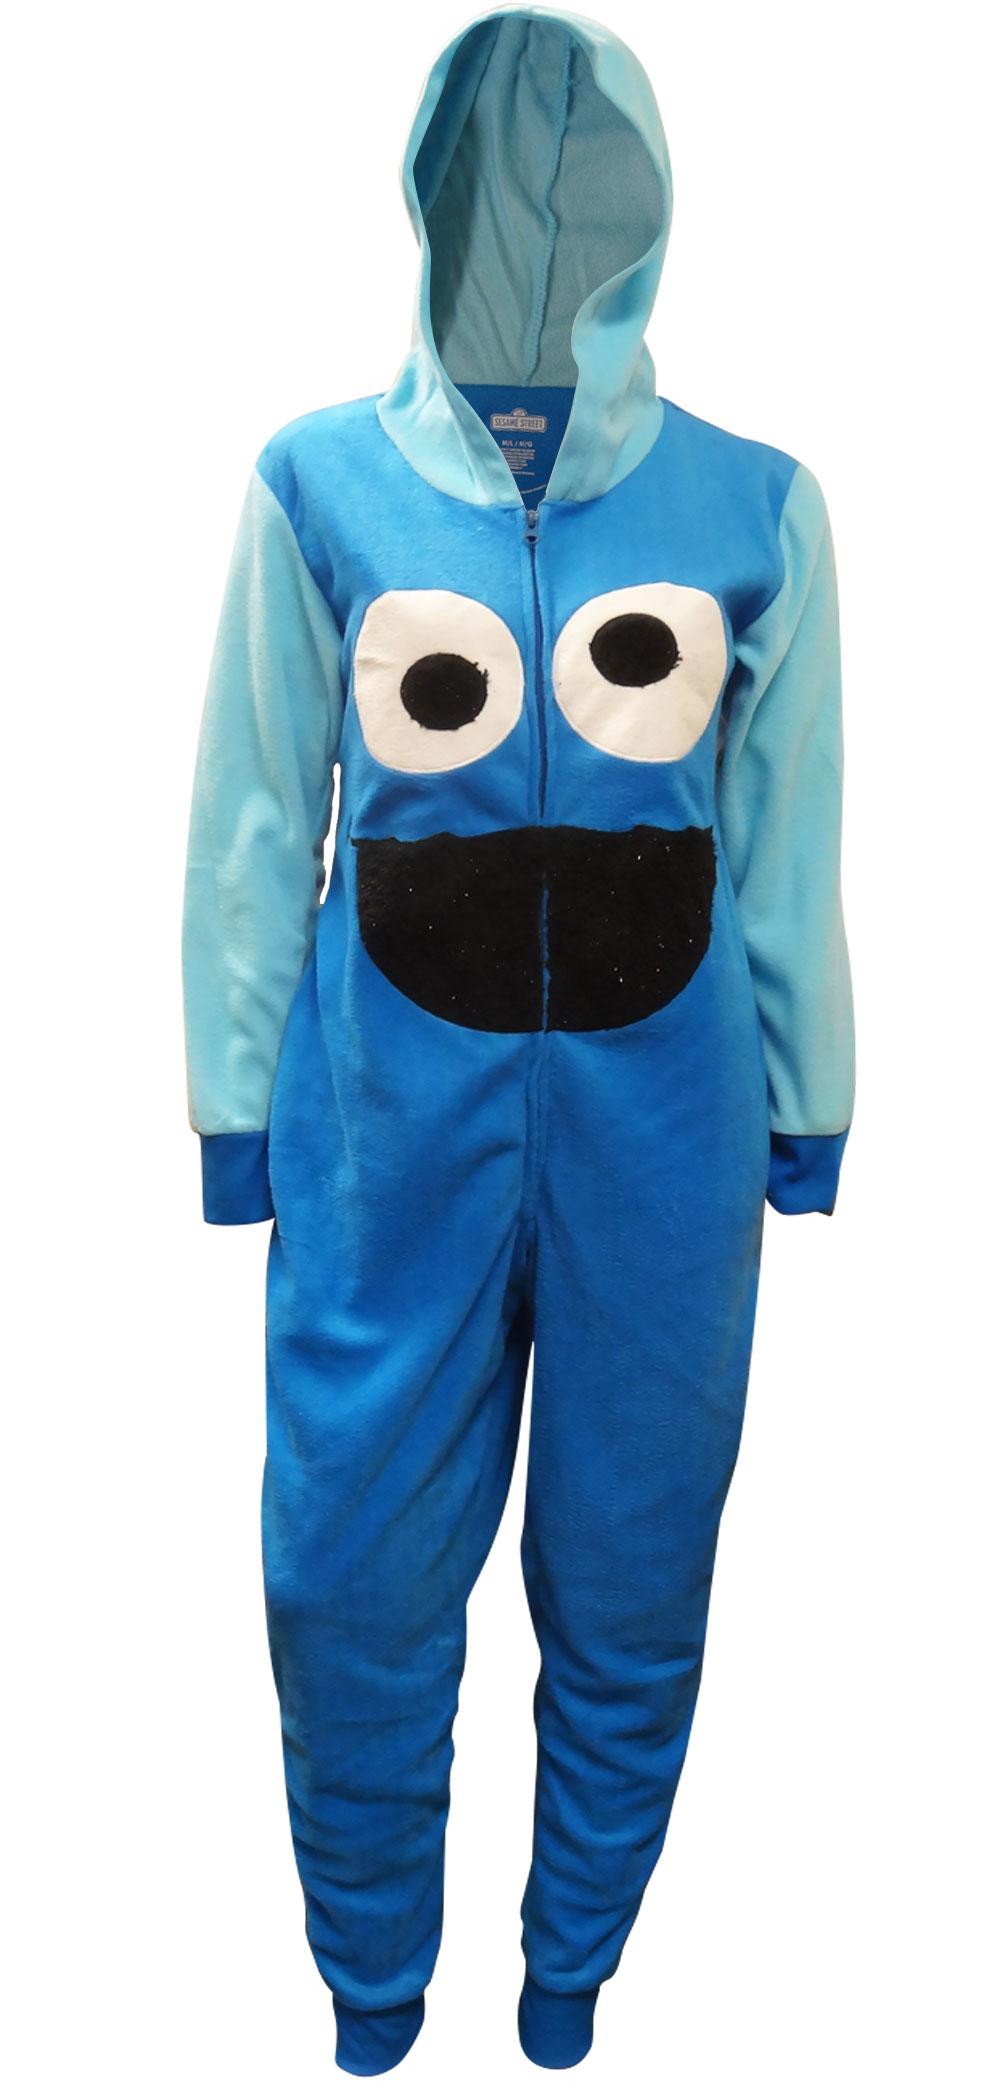 Sesame Street Cookie Monster Hooded e Piece Pajamas Walmart